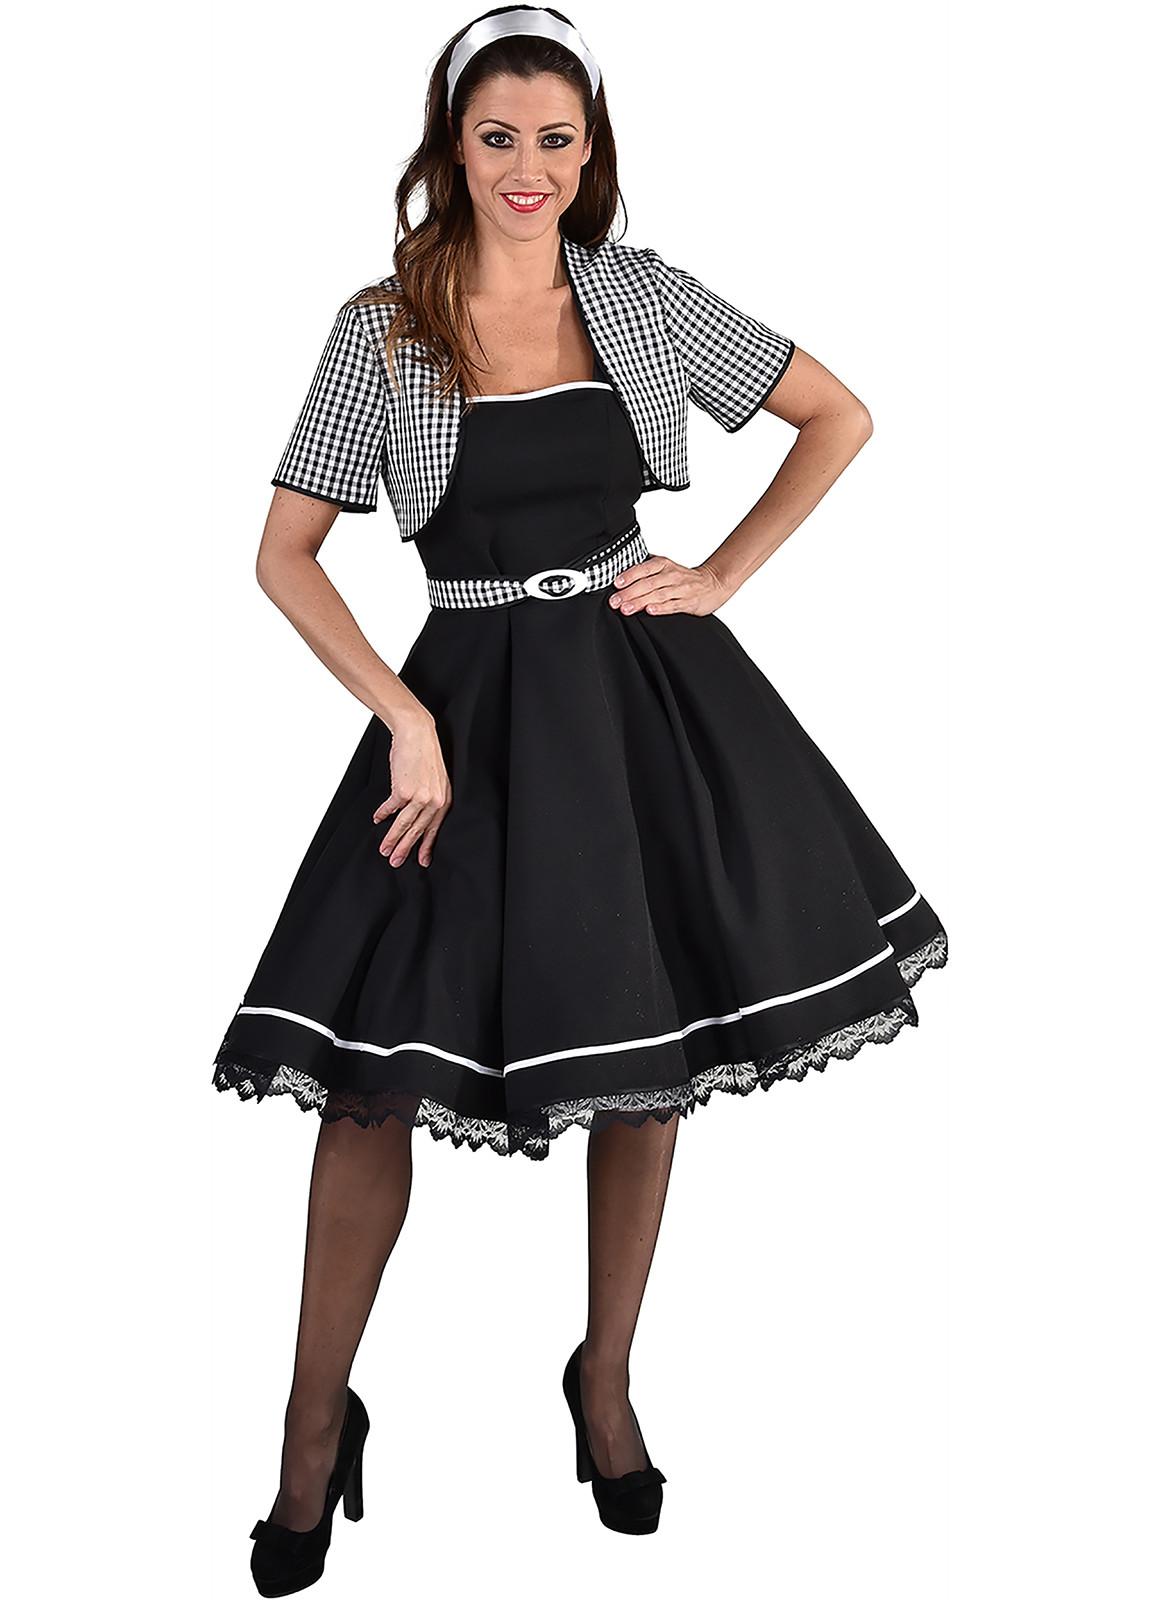 50s jurk jackie